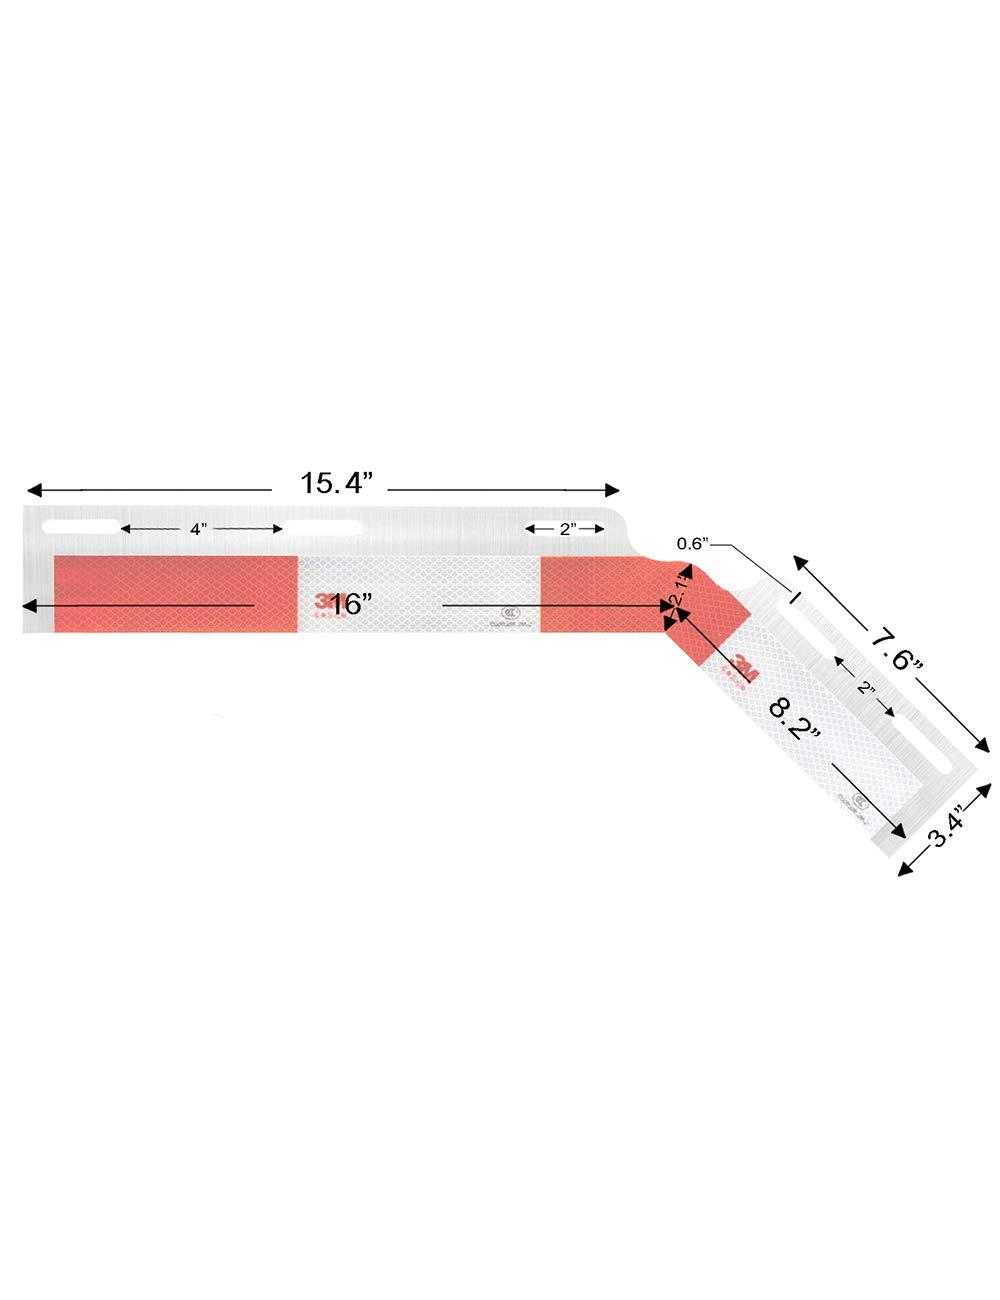 TRUCK FAIRINGS COM Mud Flap Hanger 3M Reflector 45-Degree 1 Pair 2pc